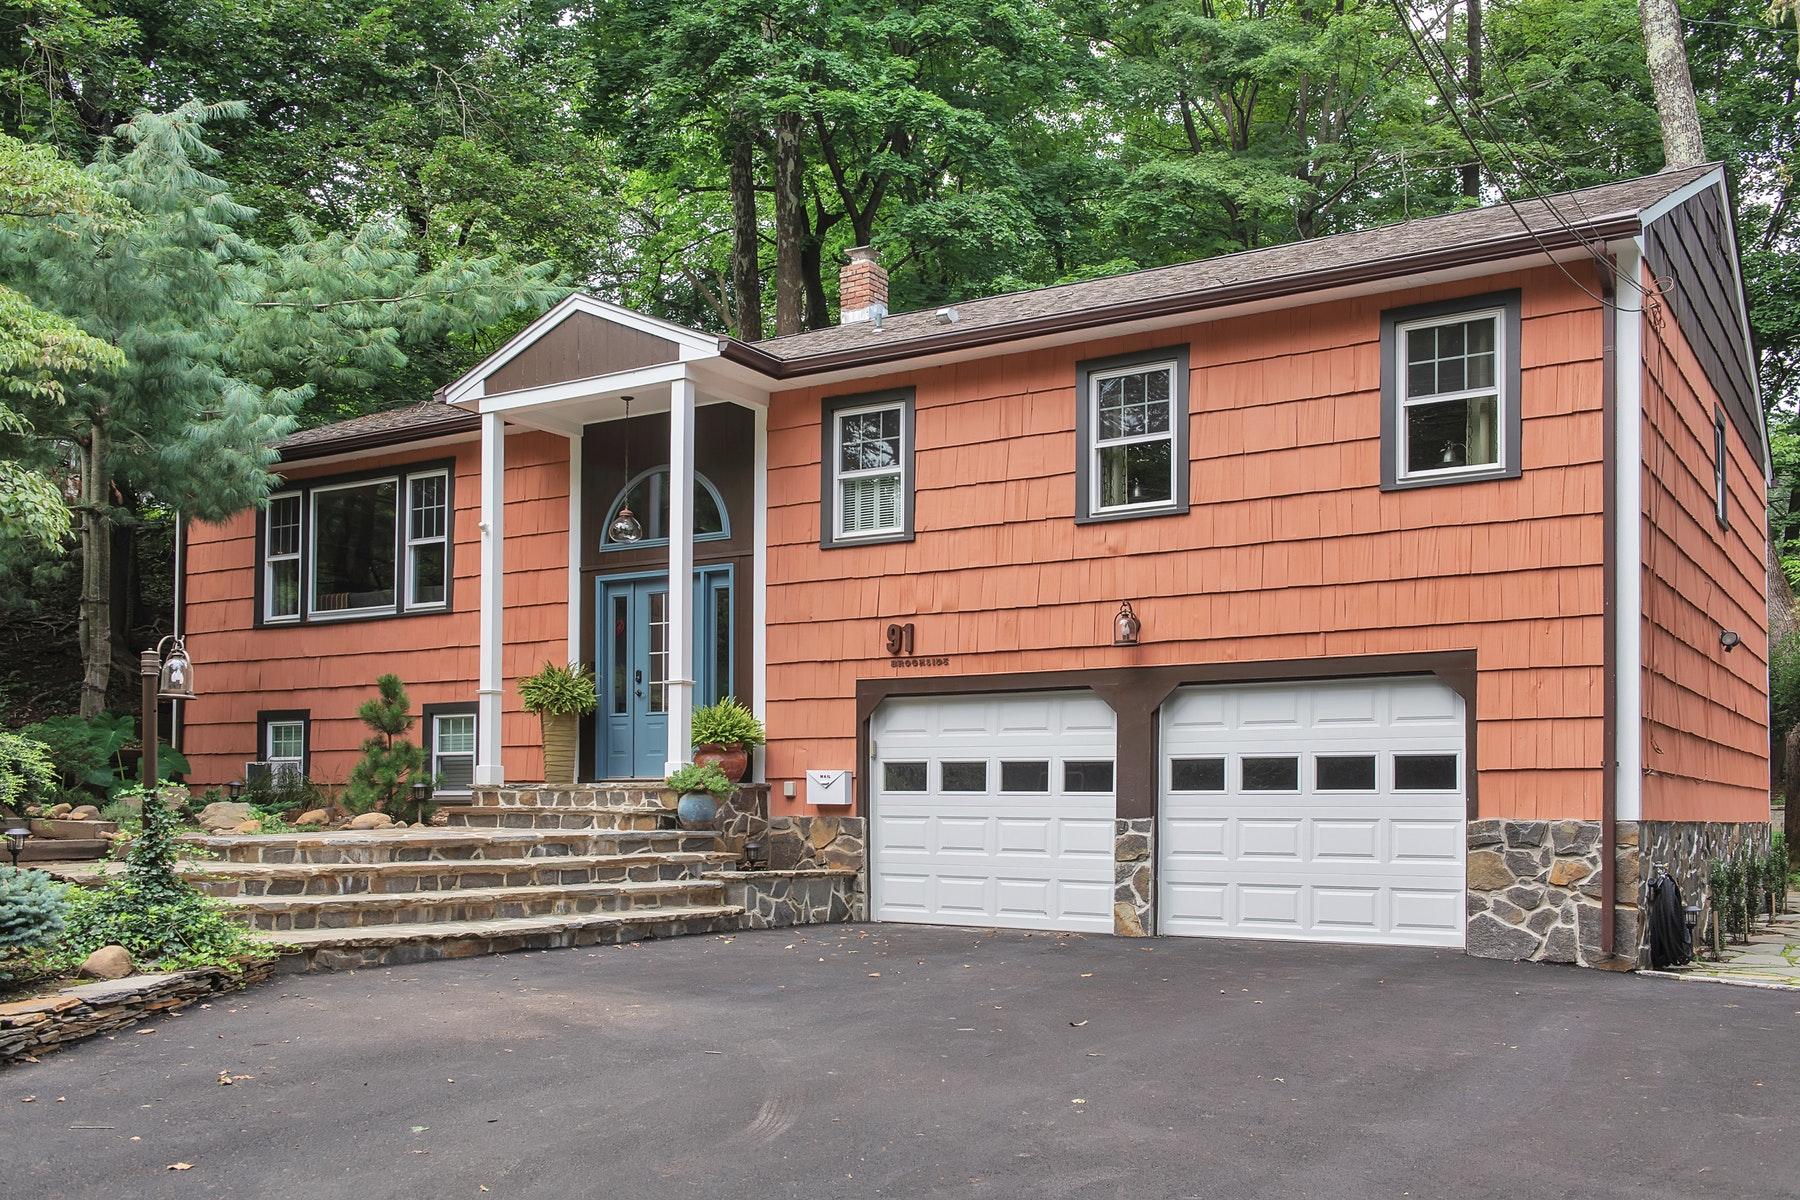 Property 为 销售 在 Renovated Caldwell Bi-level Home 91 Brookside Avenue, Caldwell, 新泽西州 07006 美国